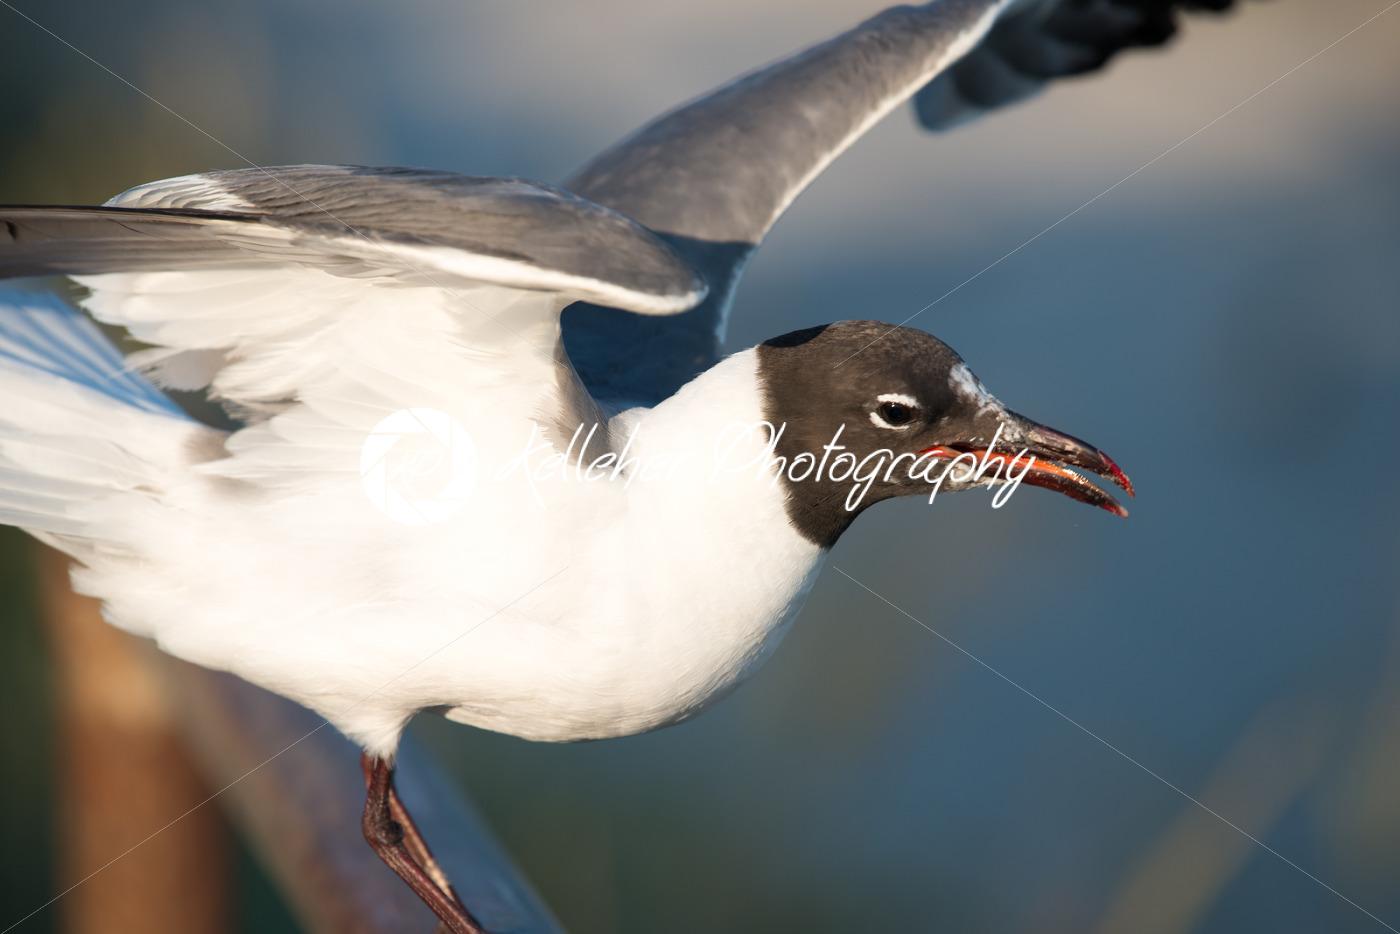 Seagull getting ready to take flight on the boardwalk in Ocean City, NJ - Kelleher Photography Store